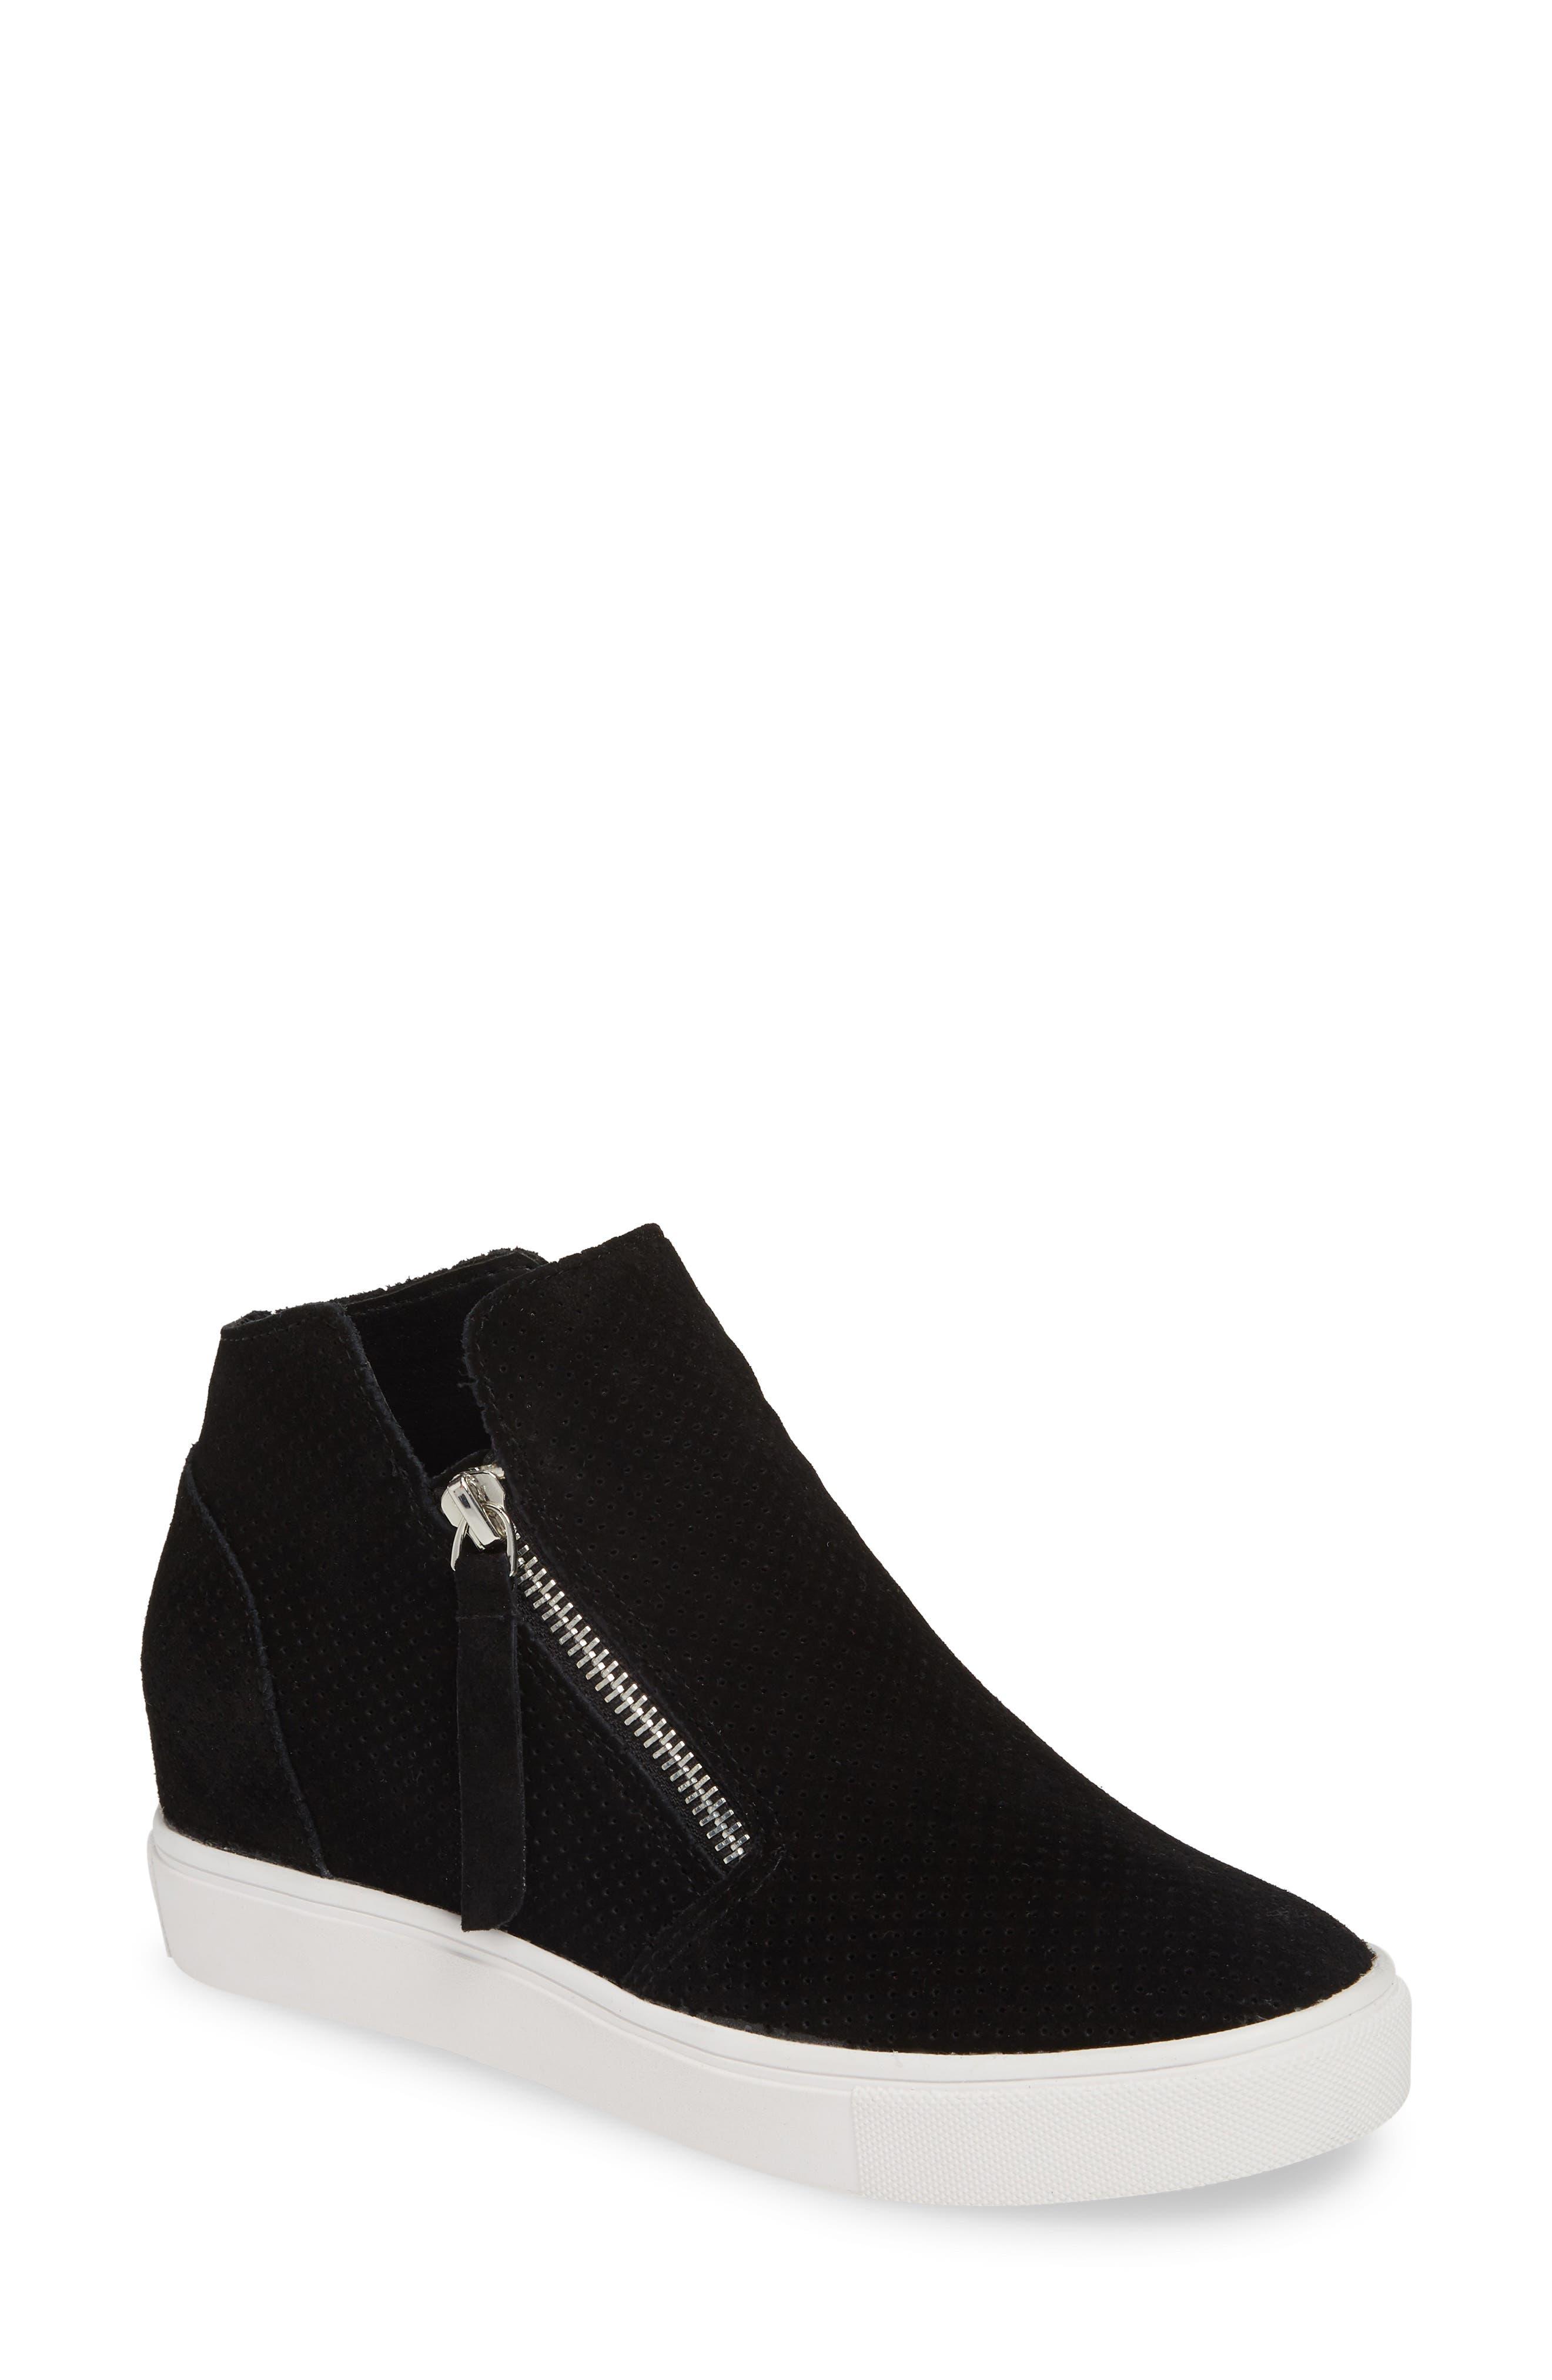 STEVE MADDEN, Caliber High Top Sneaker, Main thumbnail 1, color, BLACK SUEDE